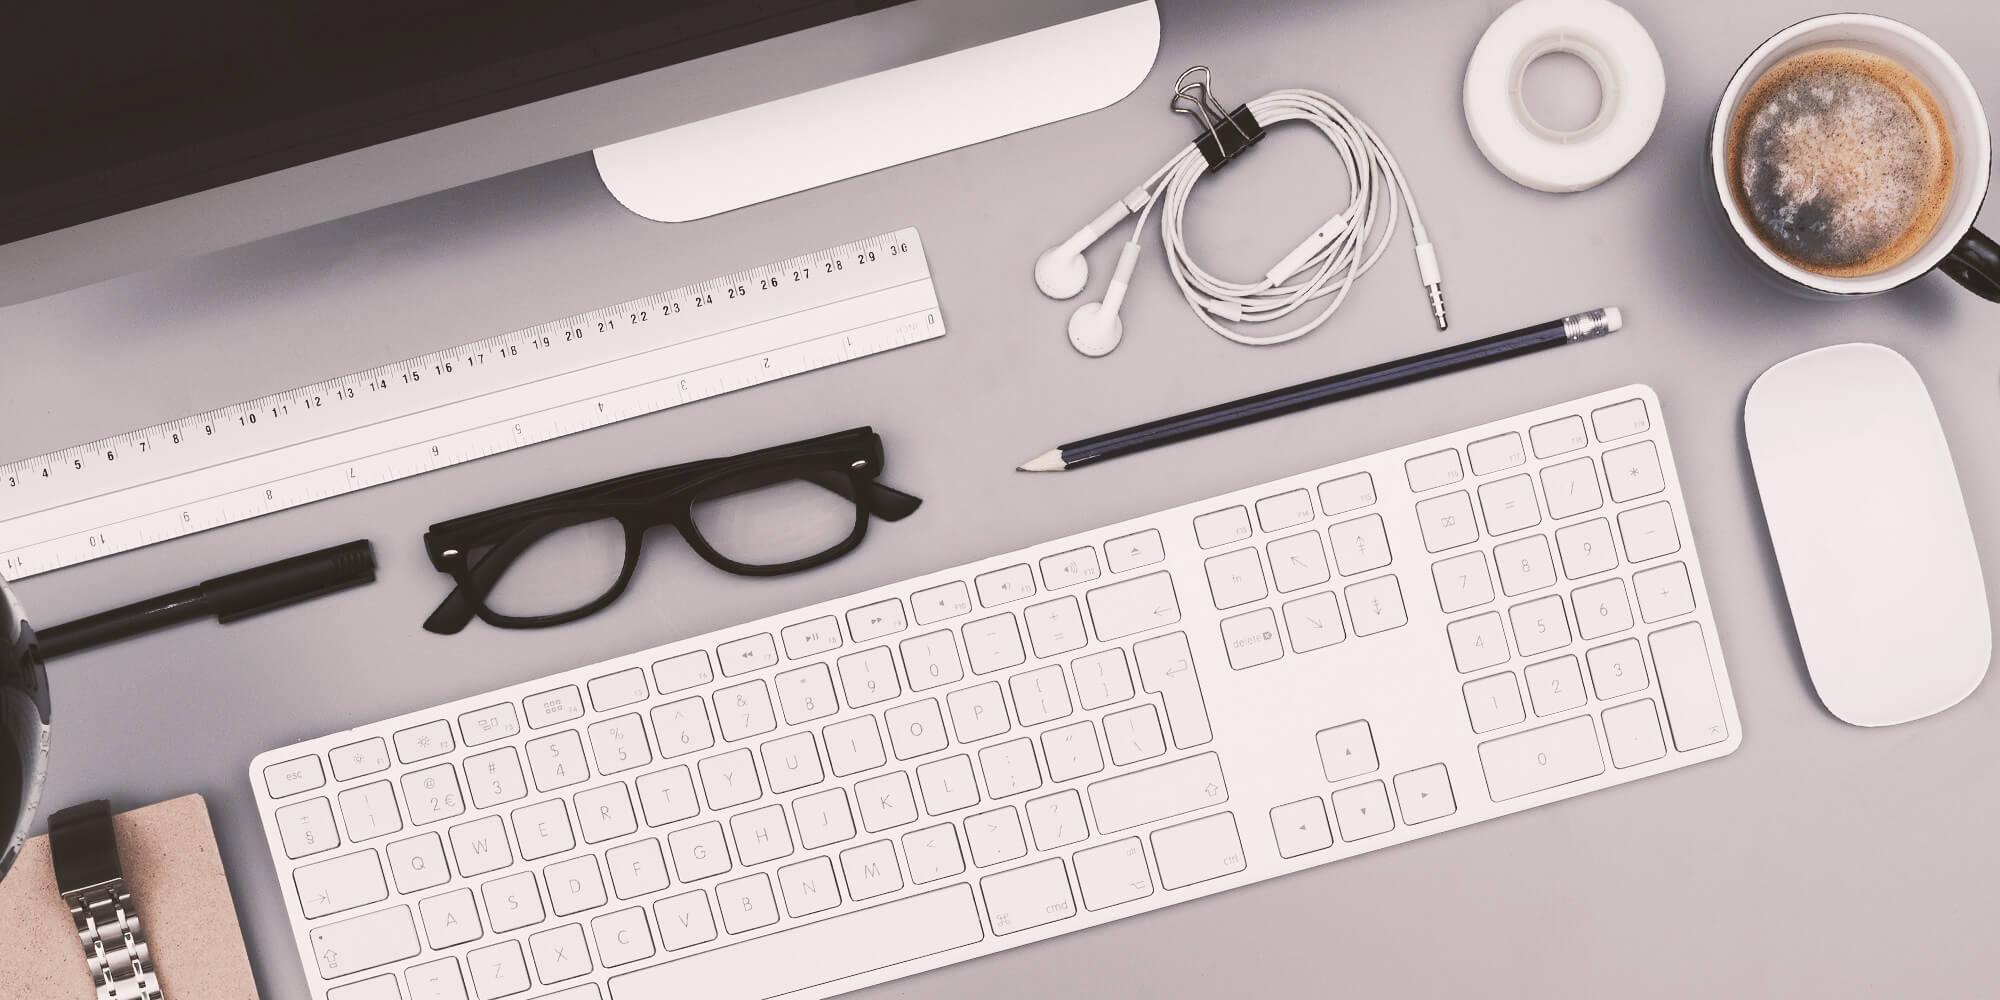 miglior design blog in italia